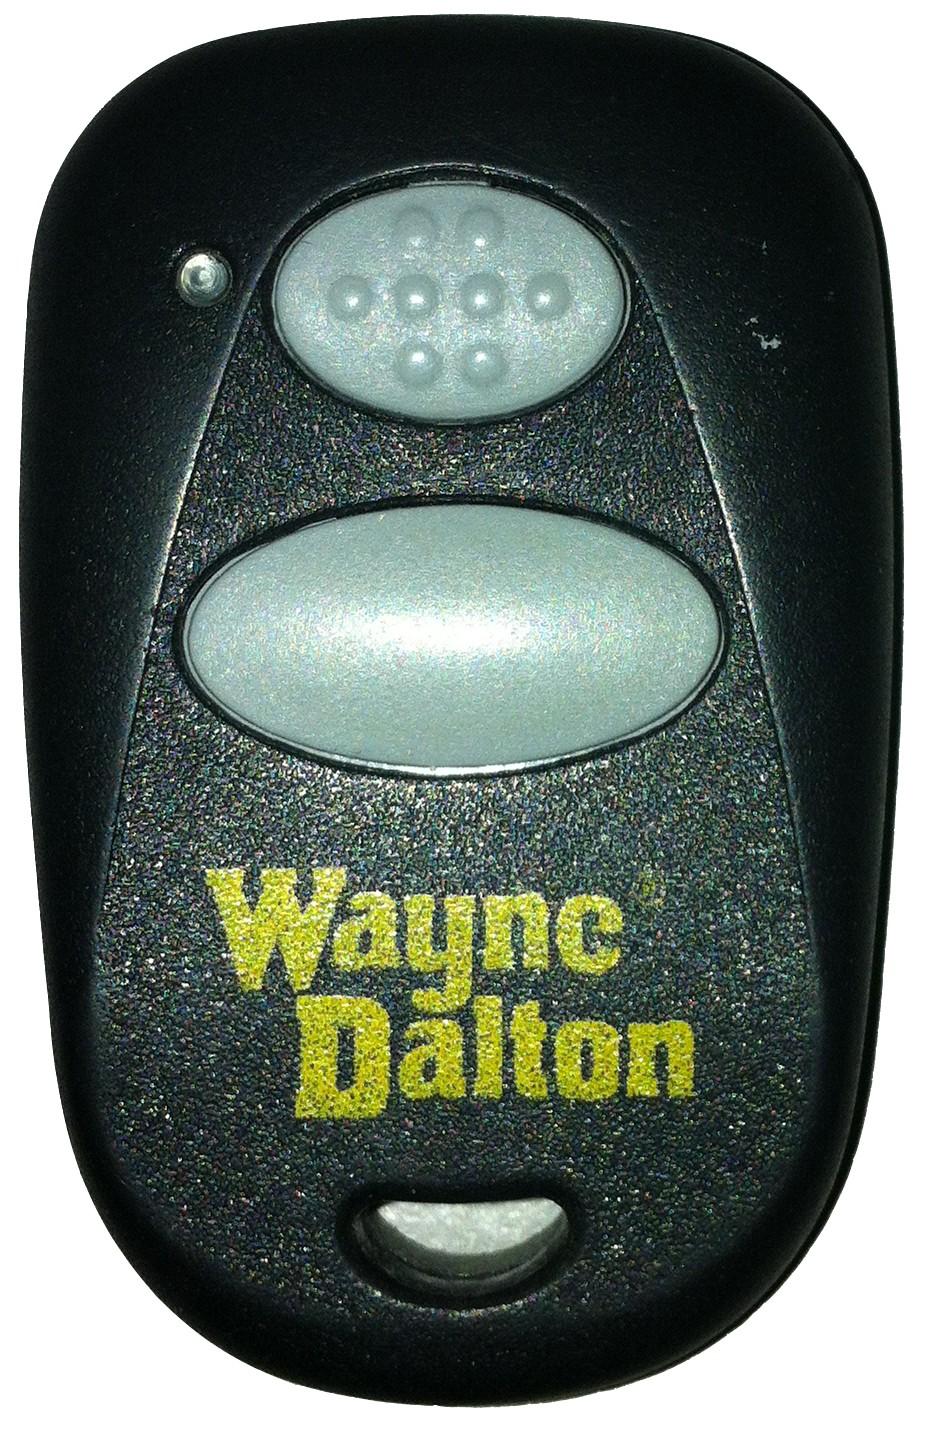 Télécommande WAYNE DALTON Push Pull - Telecommande porte de garage wayne dalton